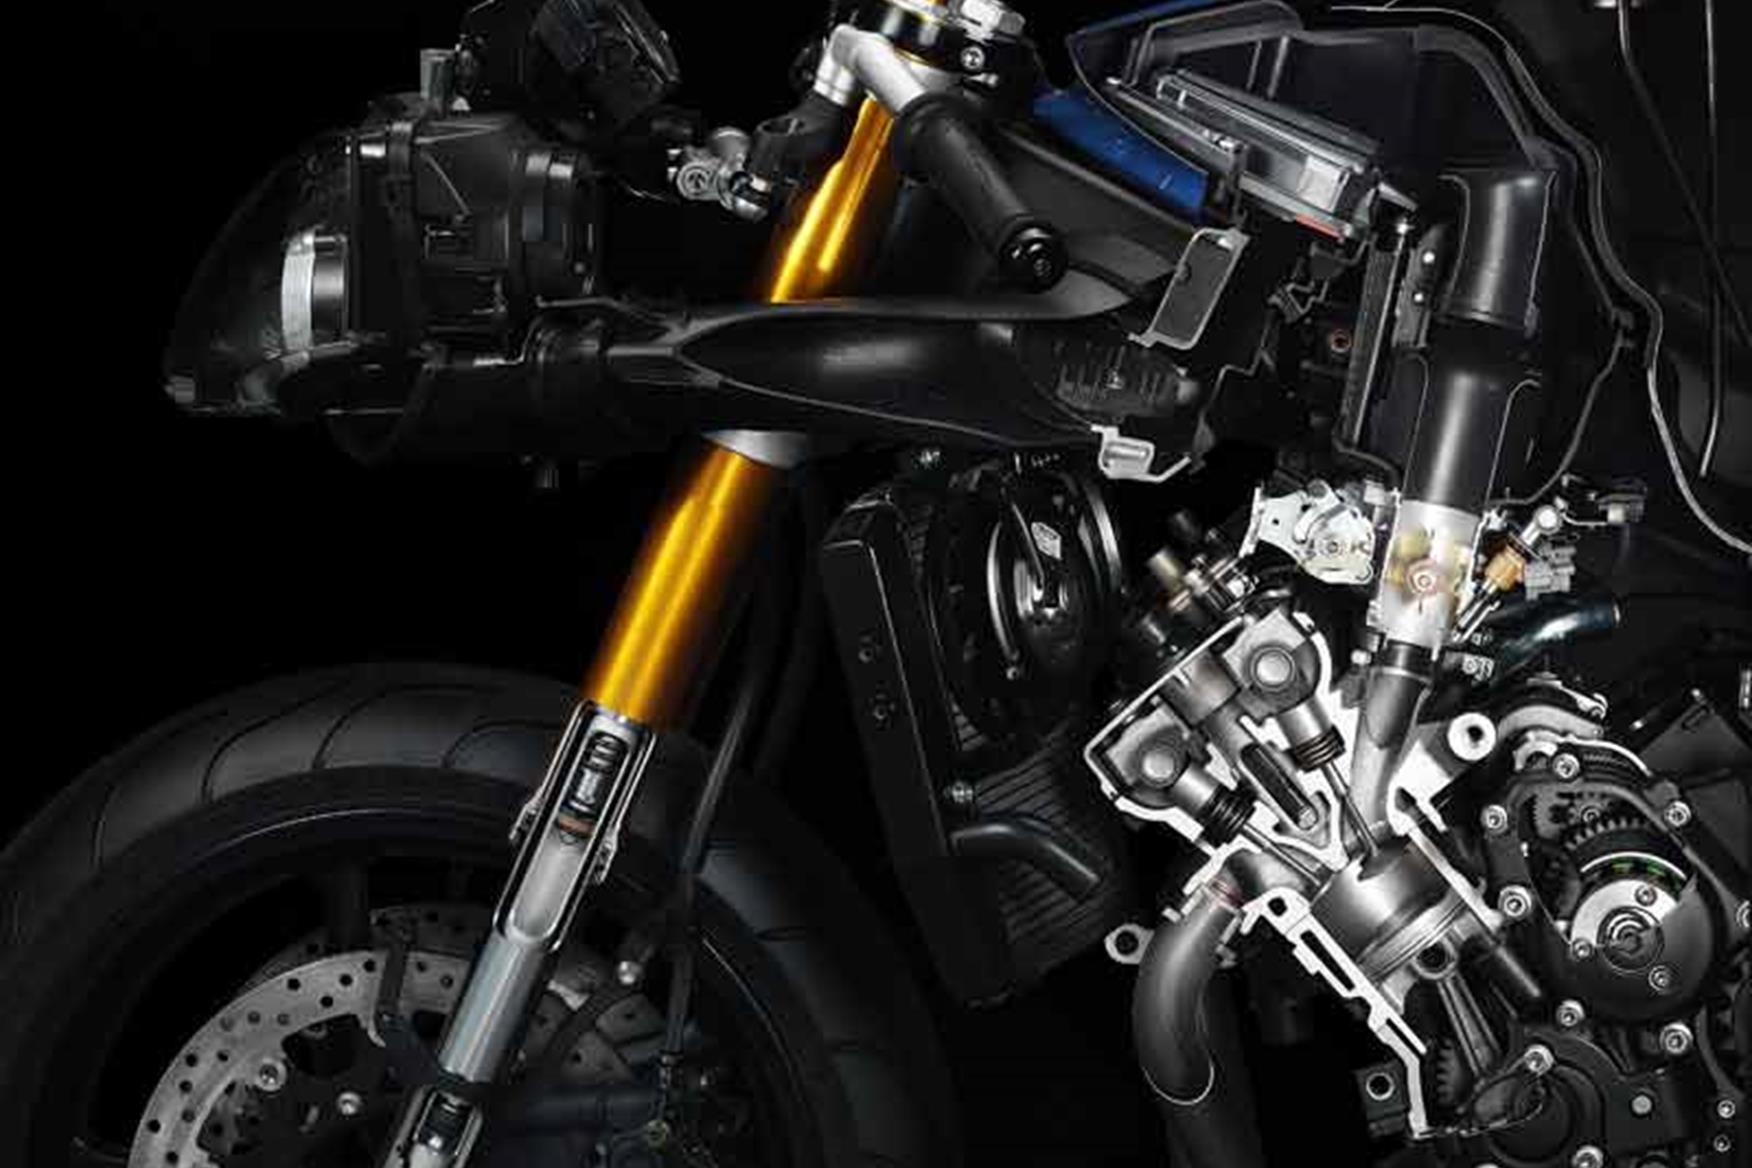 Yamaha R1 2000 Engine Diagram | Wiring Diagram on parts for 2001 r1, 2001 kawasaki r1, 2001 suzuki r1,